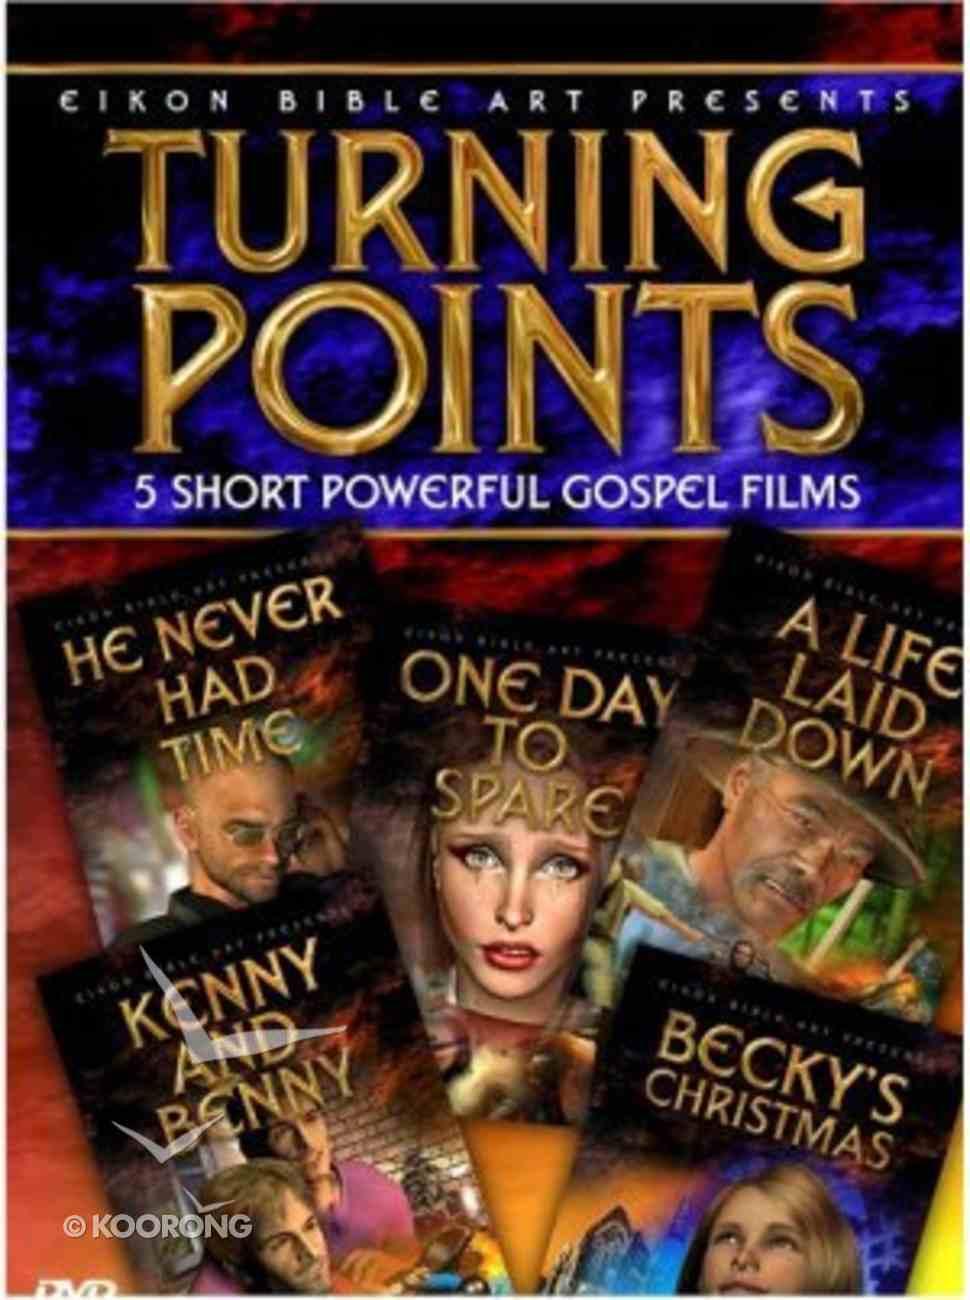 5 Short Powerful Gospel Films (Turning Points Dvd Series) DVD